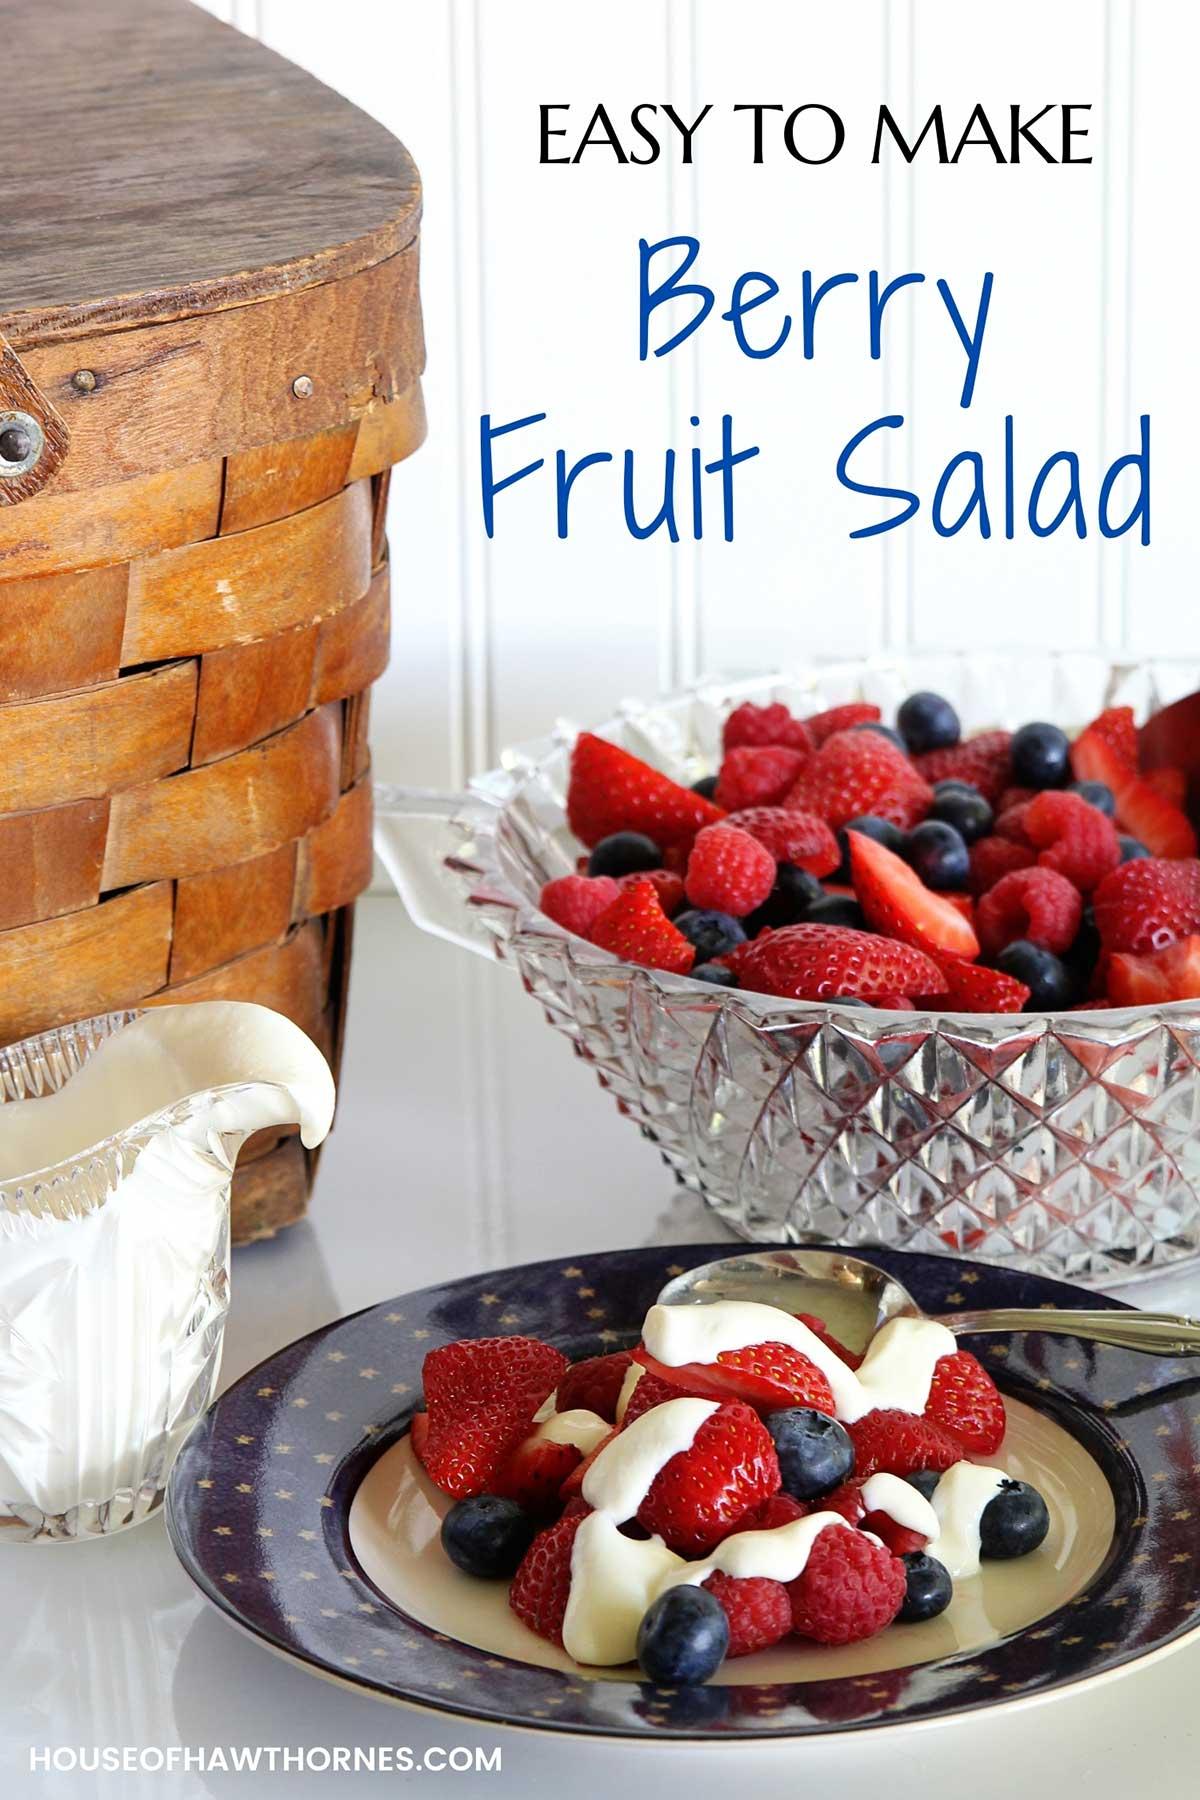 Pinterest image for berry fruit salad.